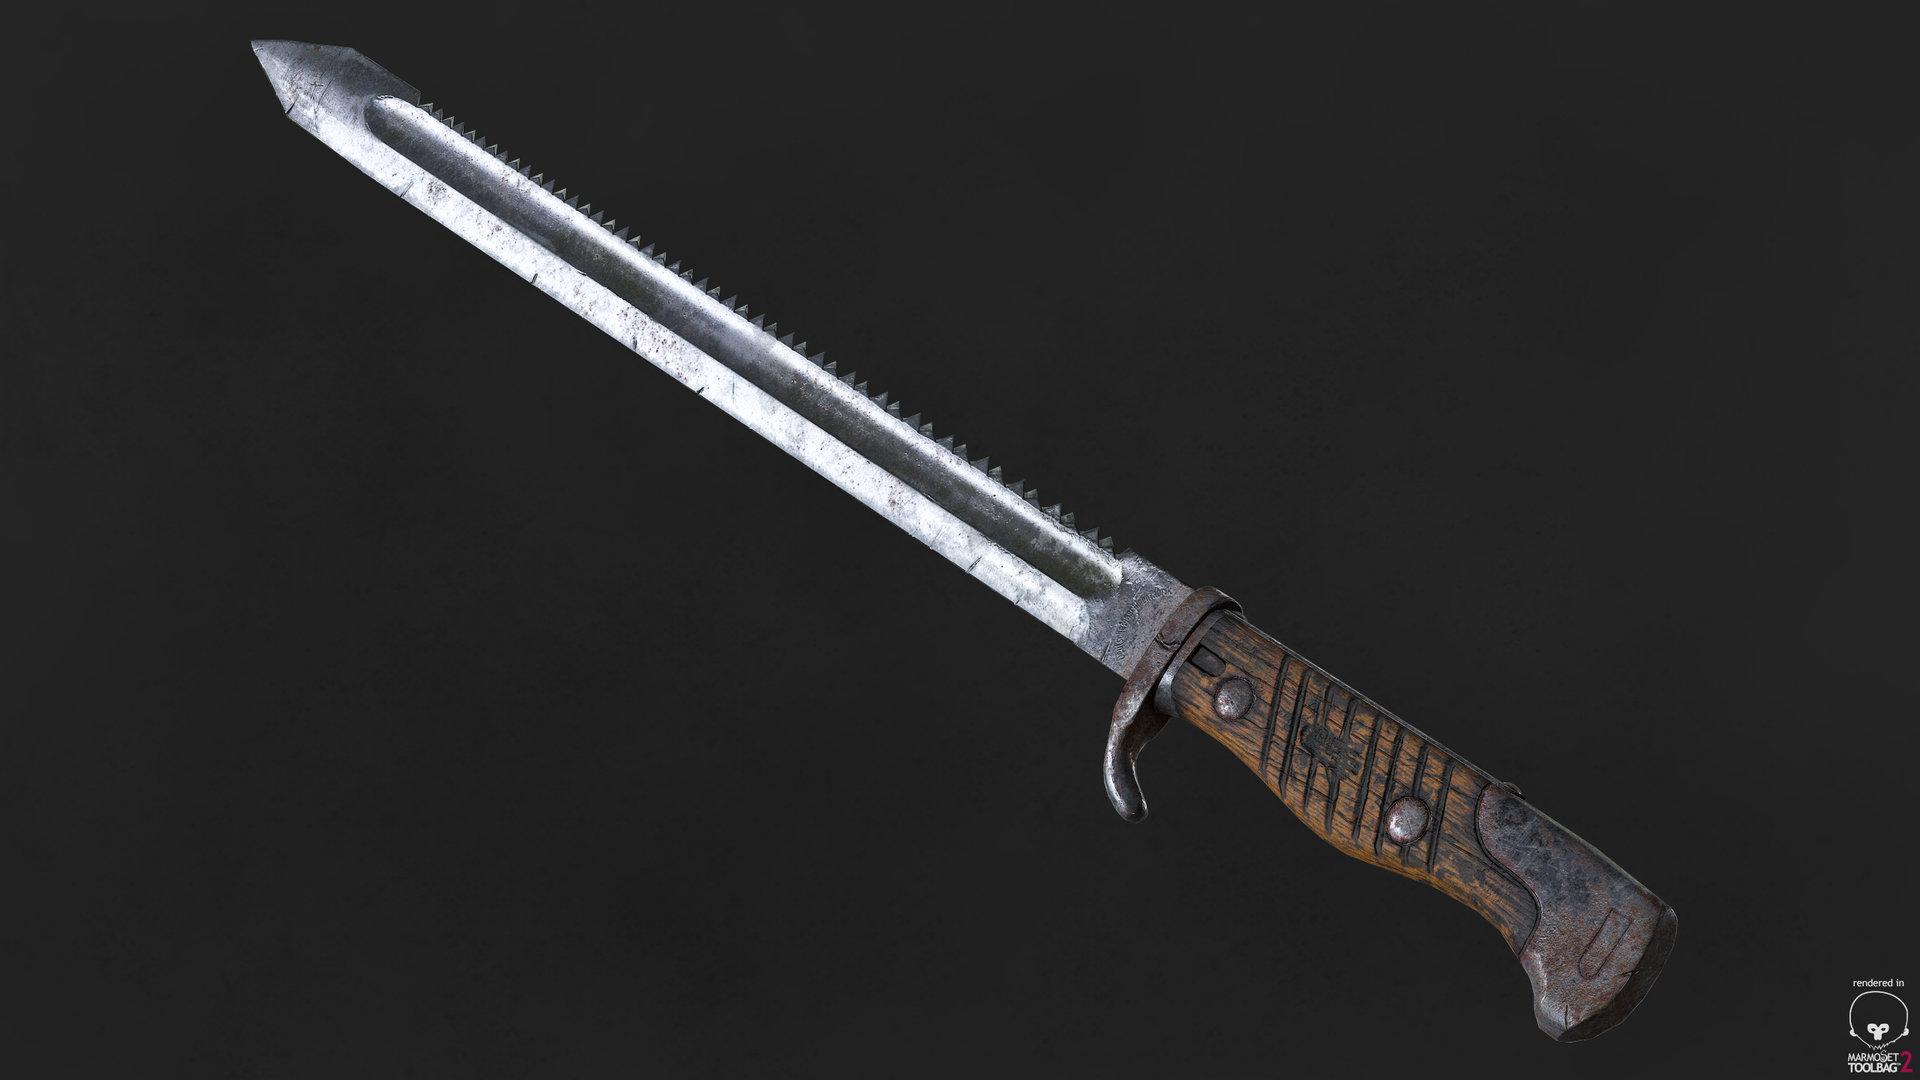 sebastian-schade-ww1-knife-01.jpg?1436831673